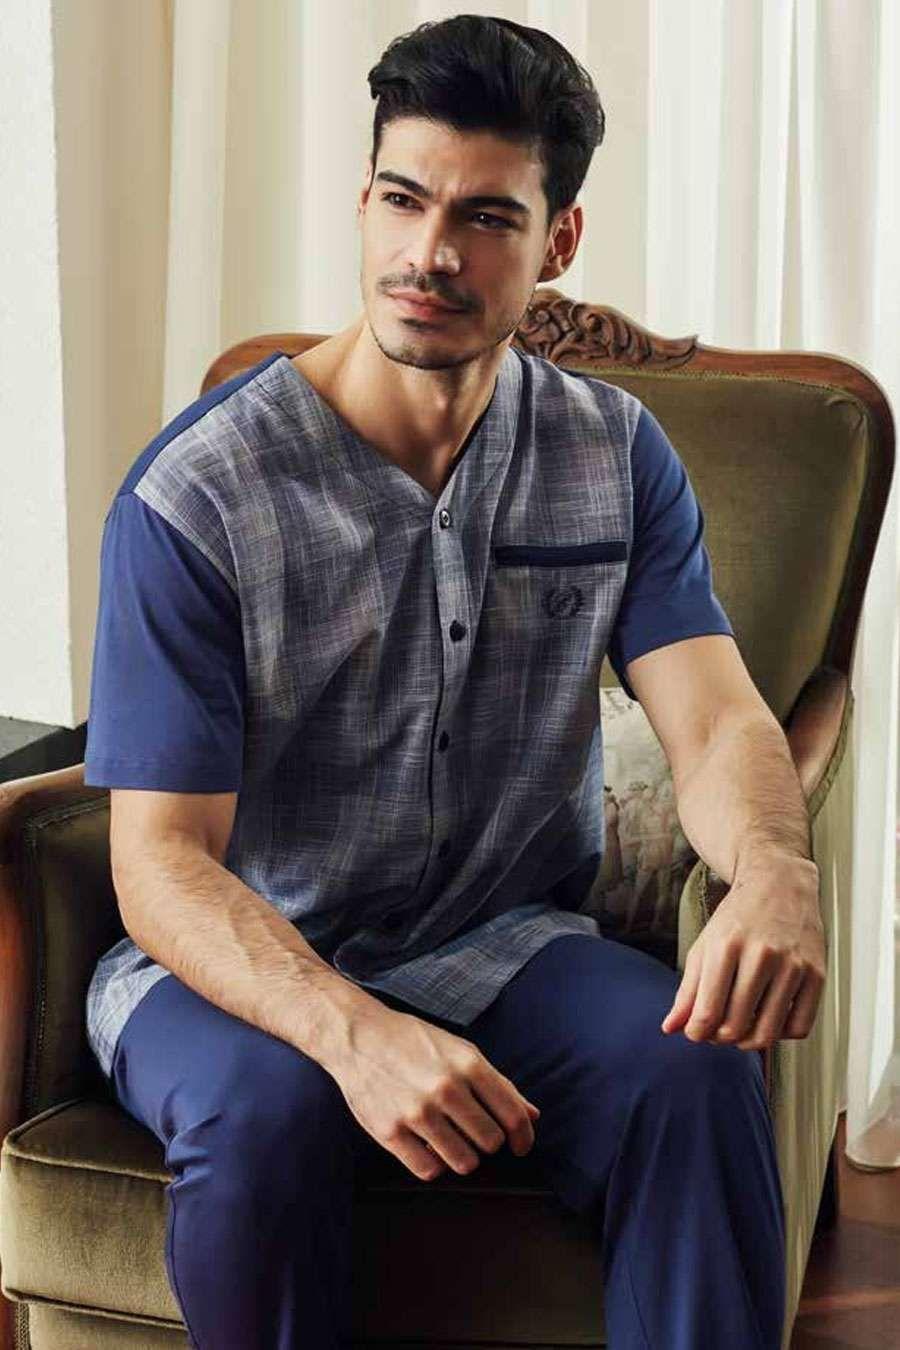 Eros 10096 Erkek Pijama Takımı I ERKEK I Eros I Eros 10096 Erkek Pijama Takımı - camasircimshop.com